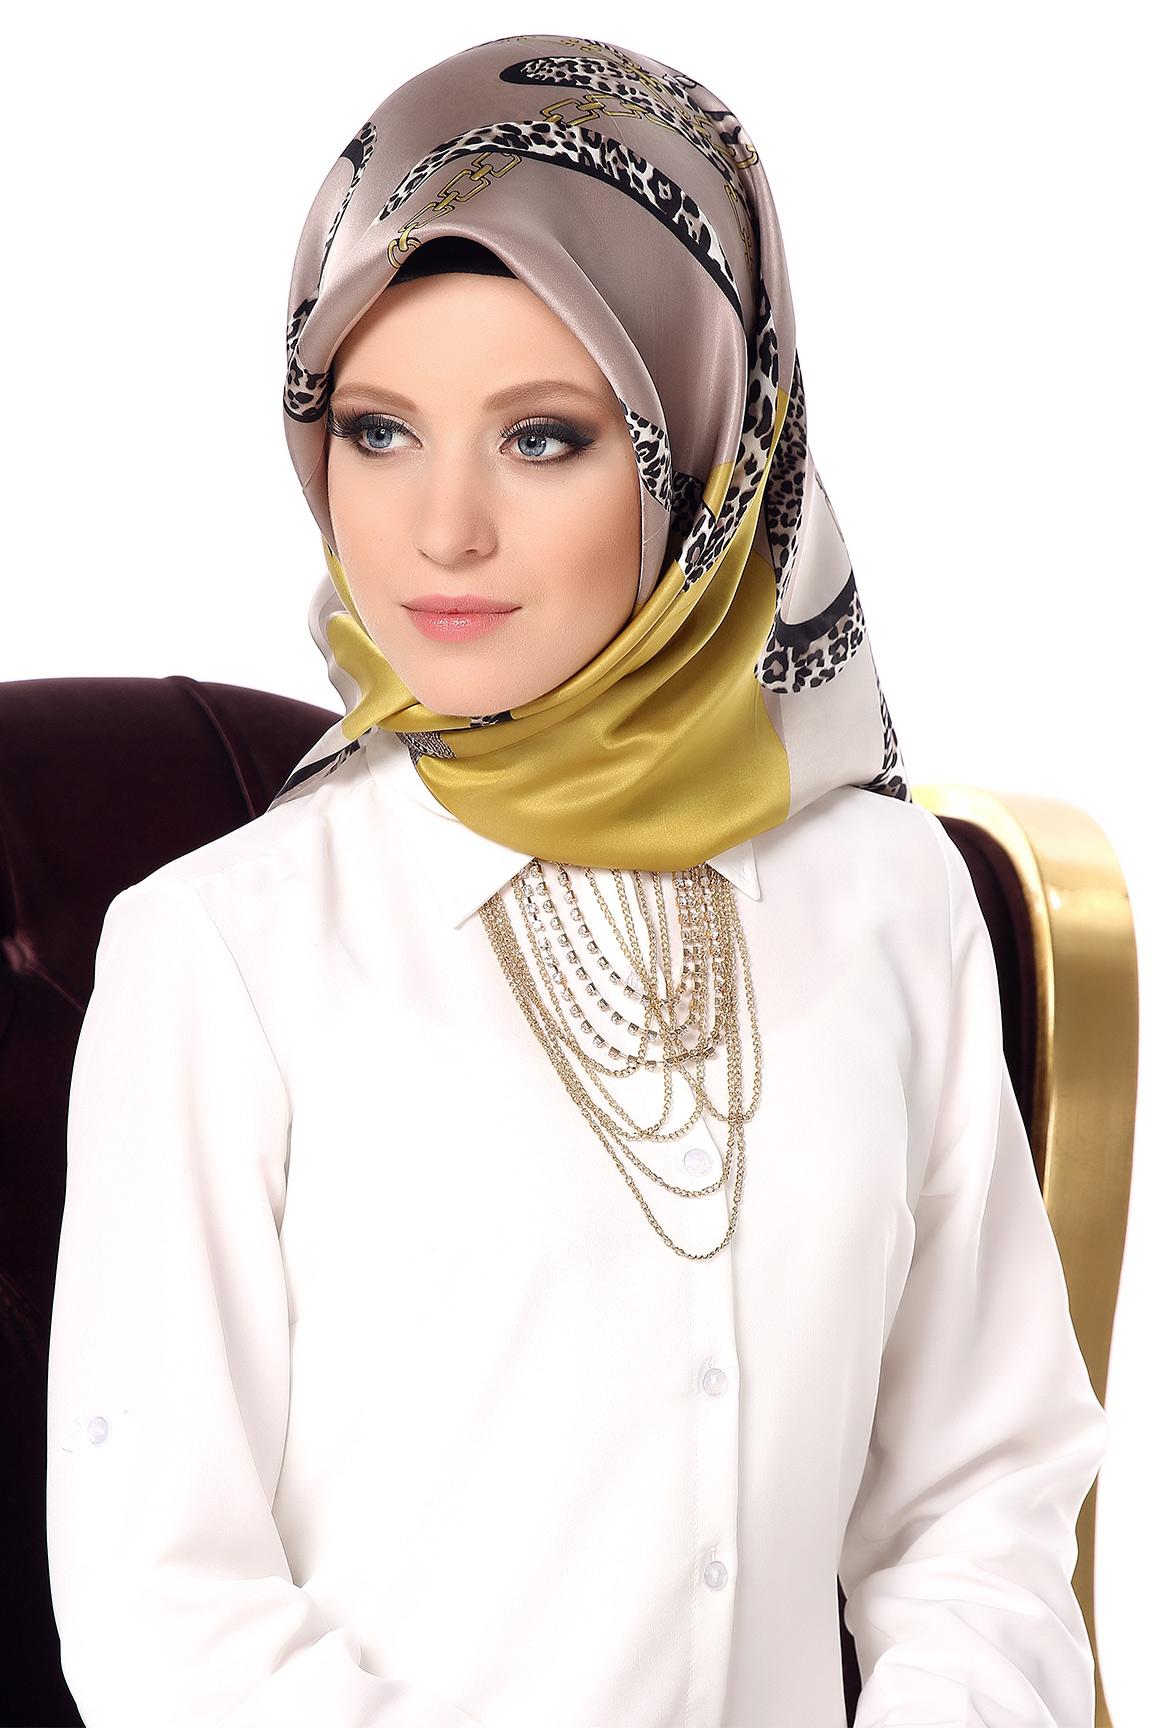 بالصور موديلات حجابات تركية , اجمل صور للحجاب التركي 2628 7